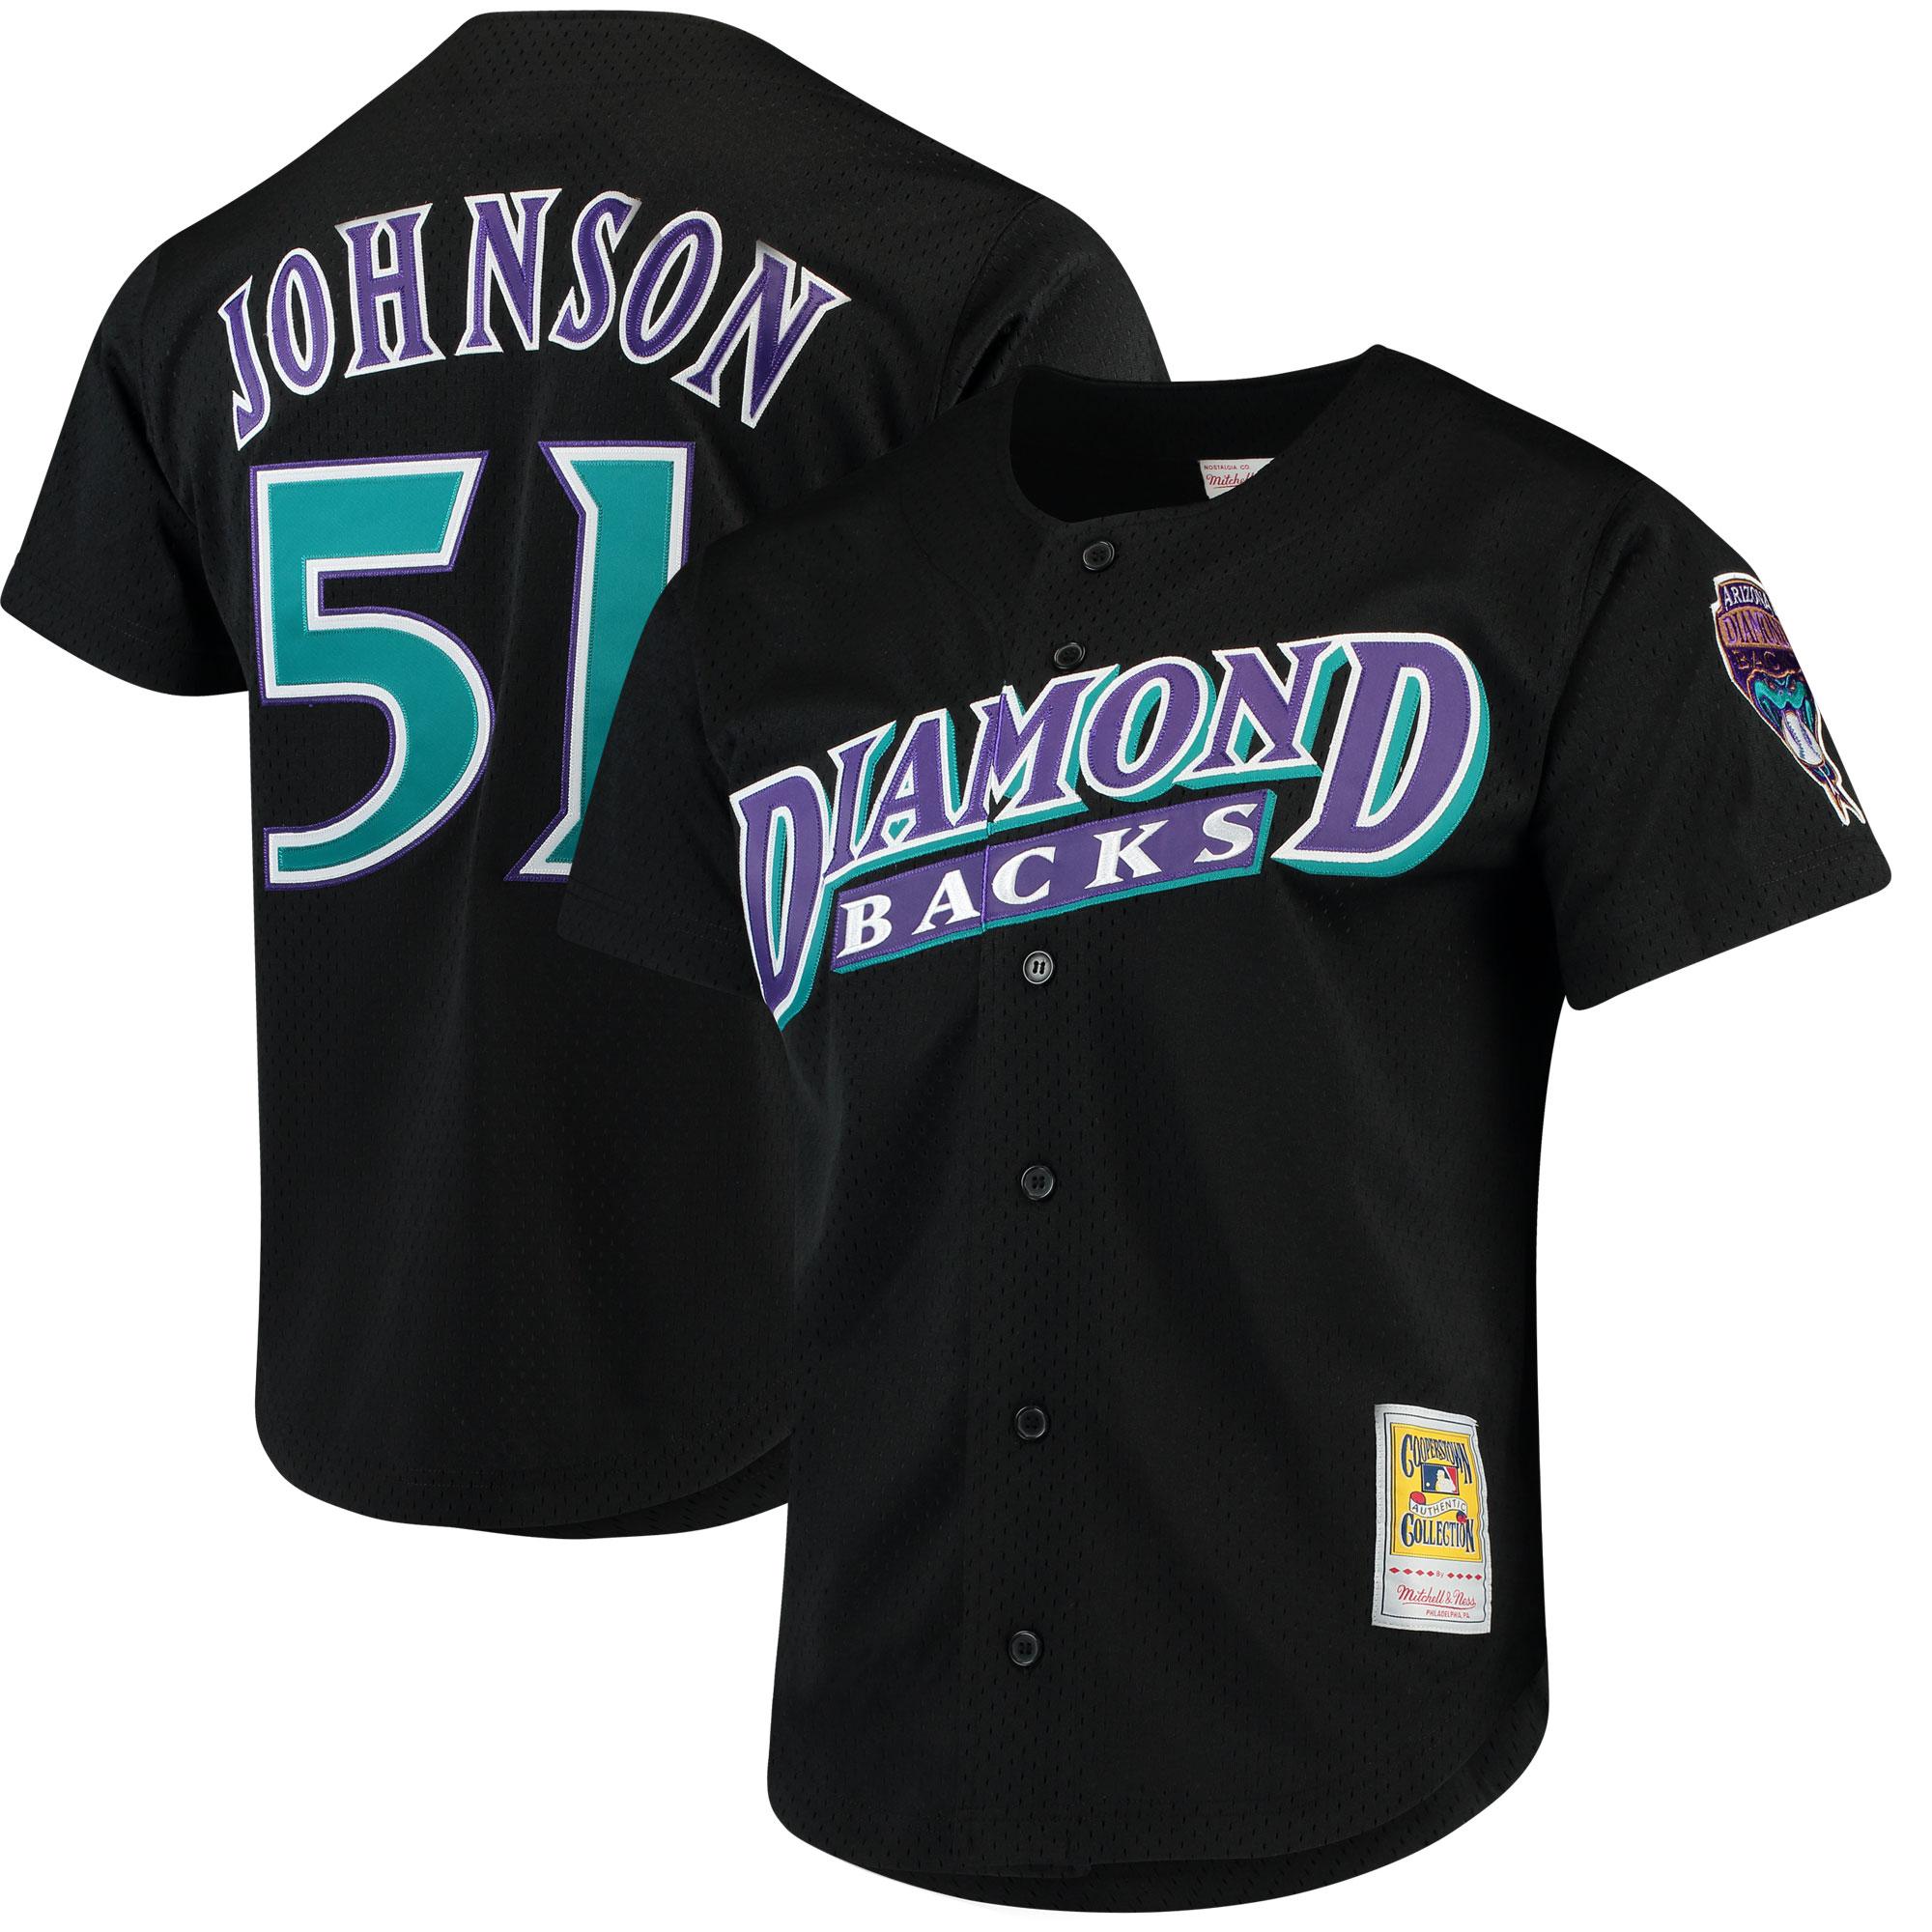 Randy Johnson Arizona Diamondbacks Mitchell & Ness Fashion Cooperstown Collection Mesh Batting Practice Jersey - Black